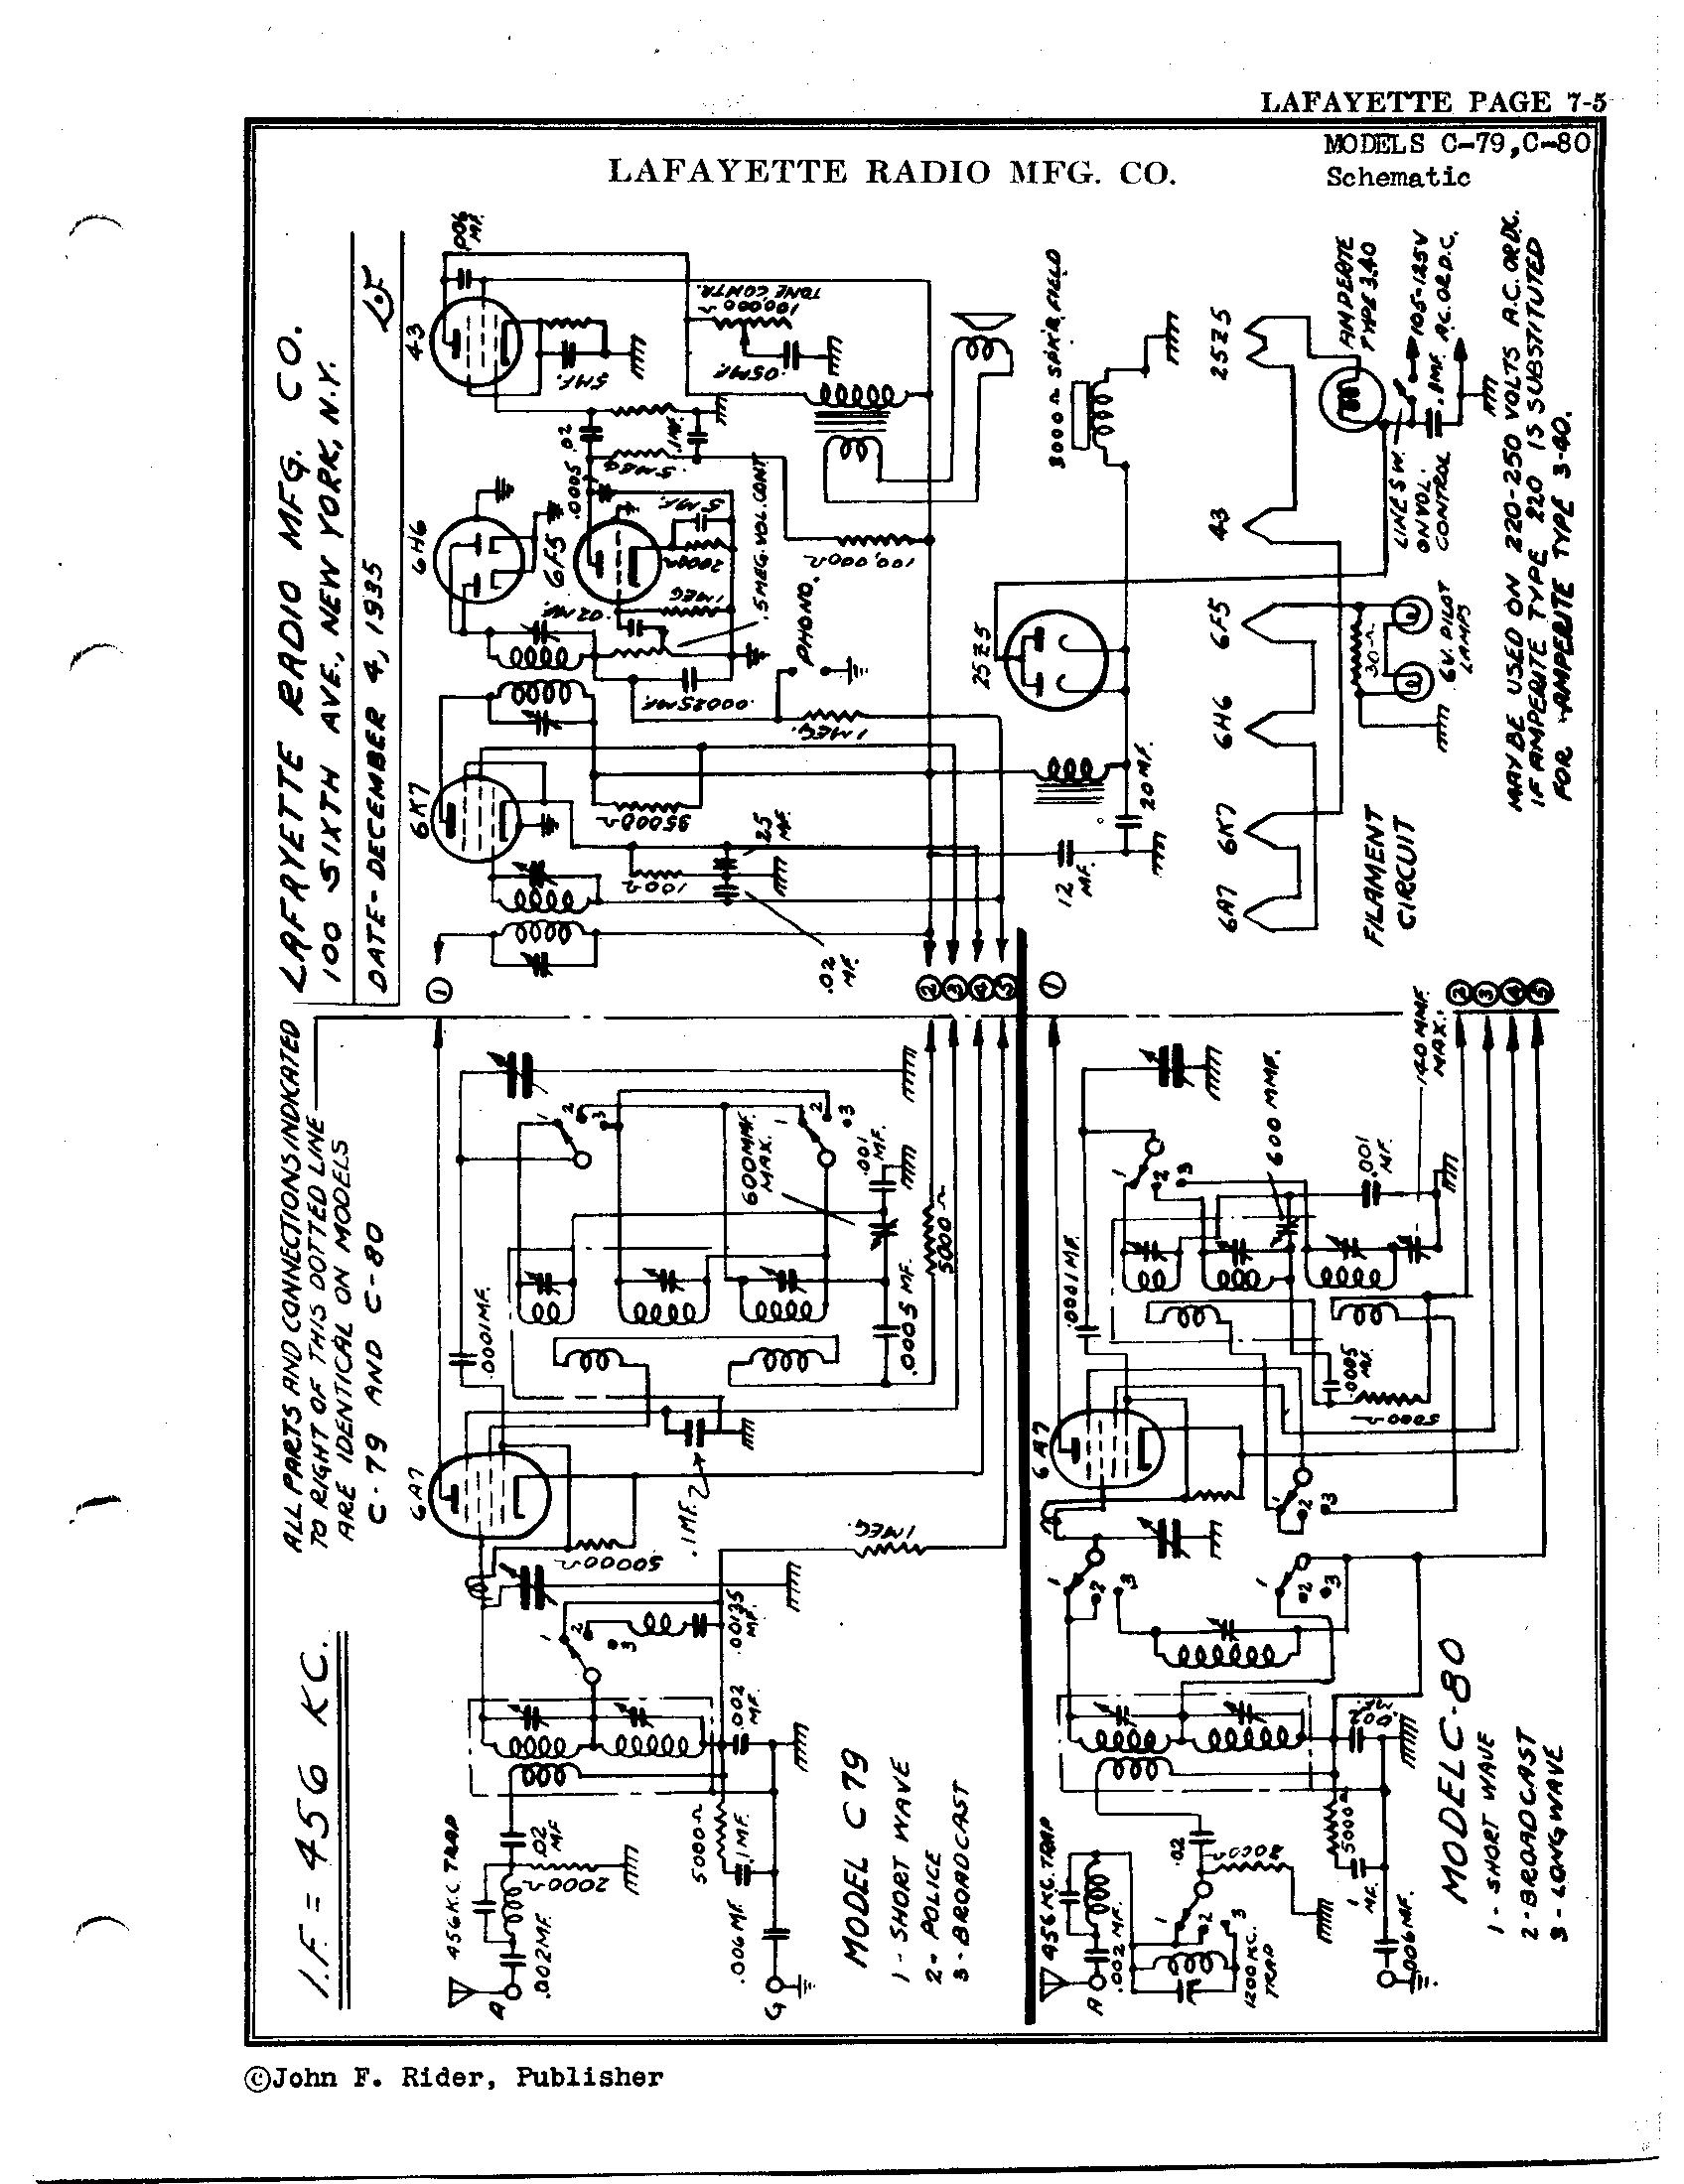 Magnificent Lafayette Wiring Diagrams Wiring Diagram Wiring Digital Resources Dylitashwinbiharinl